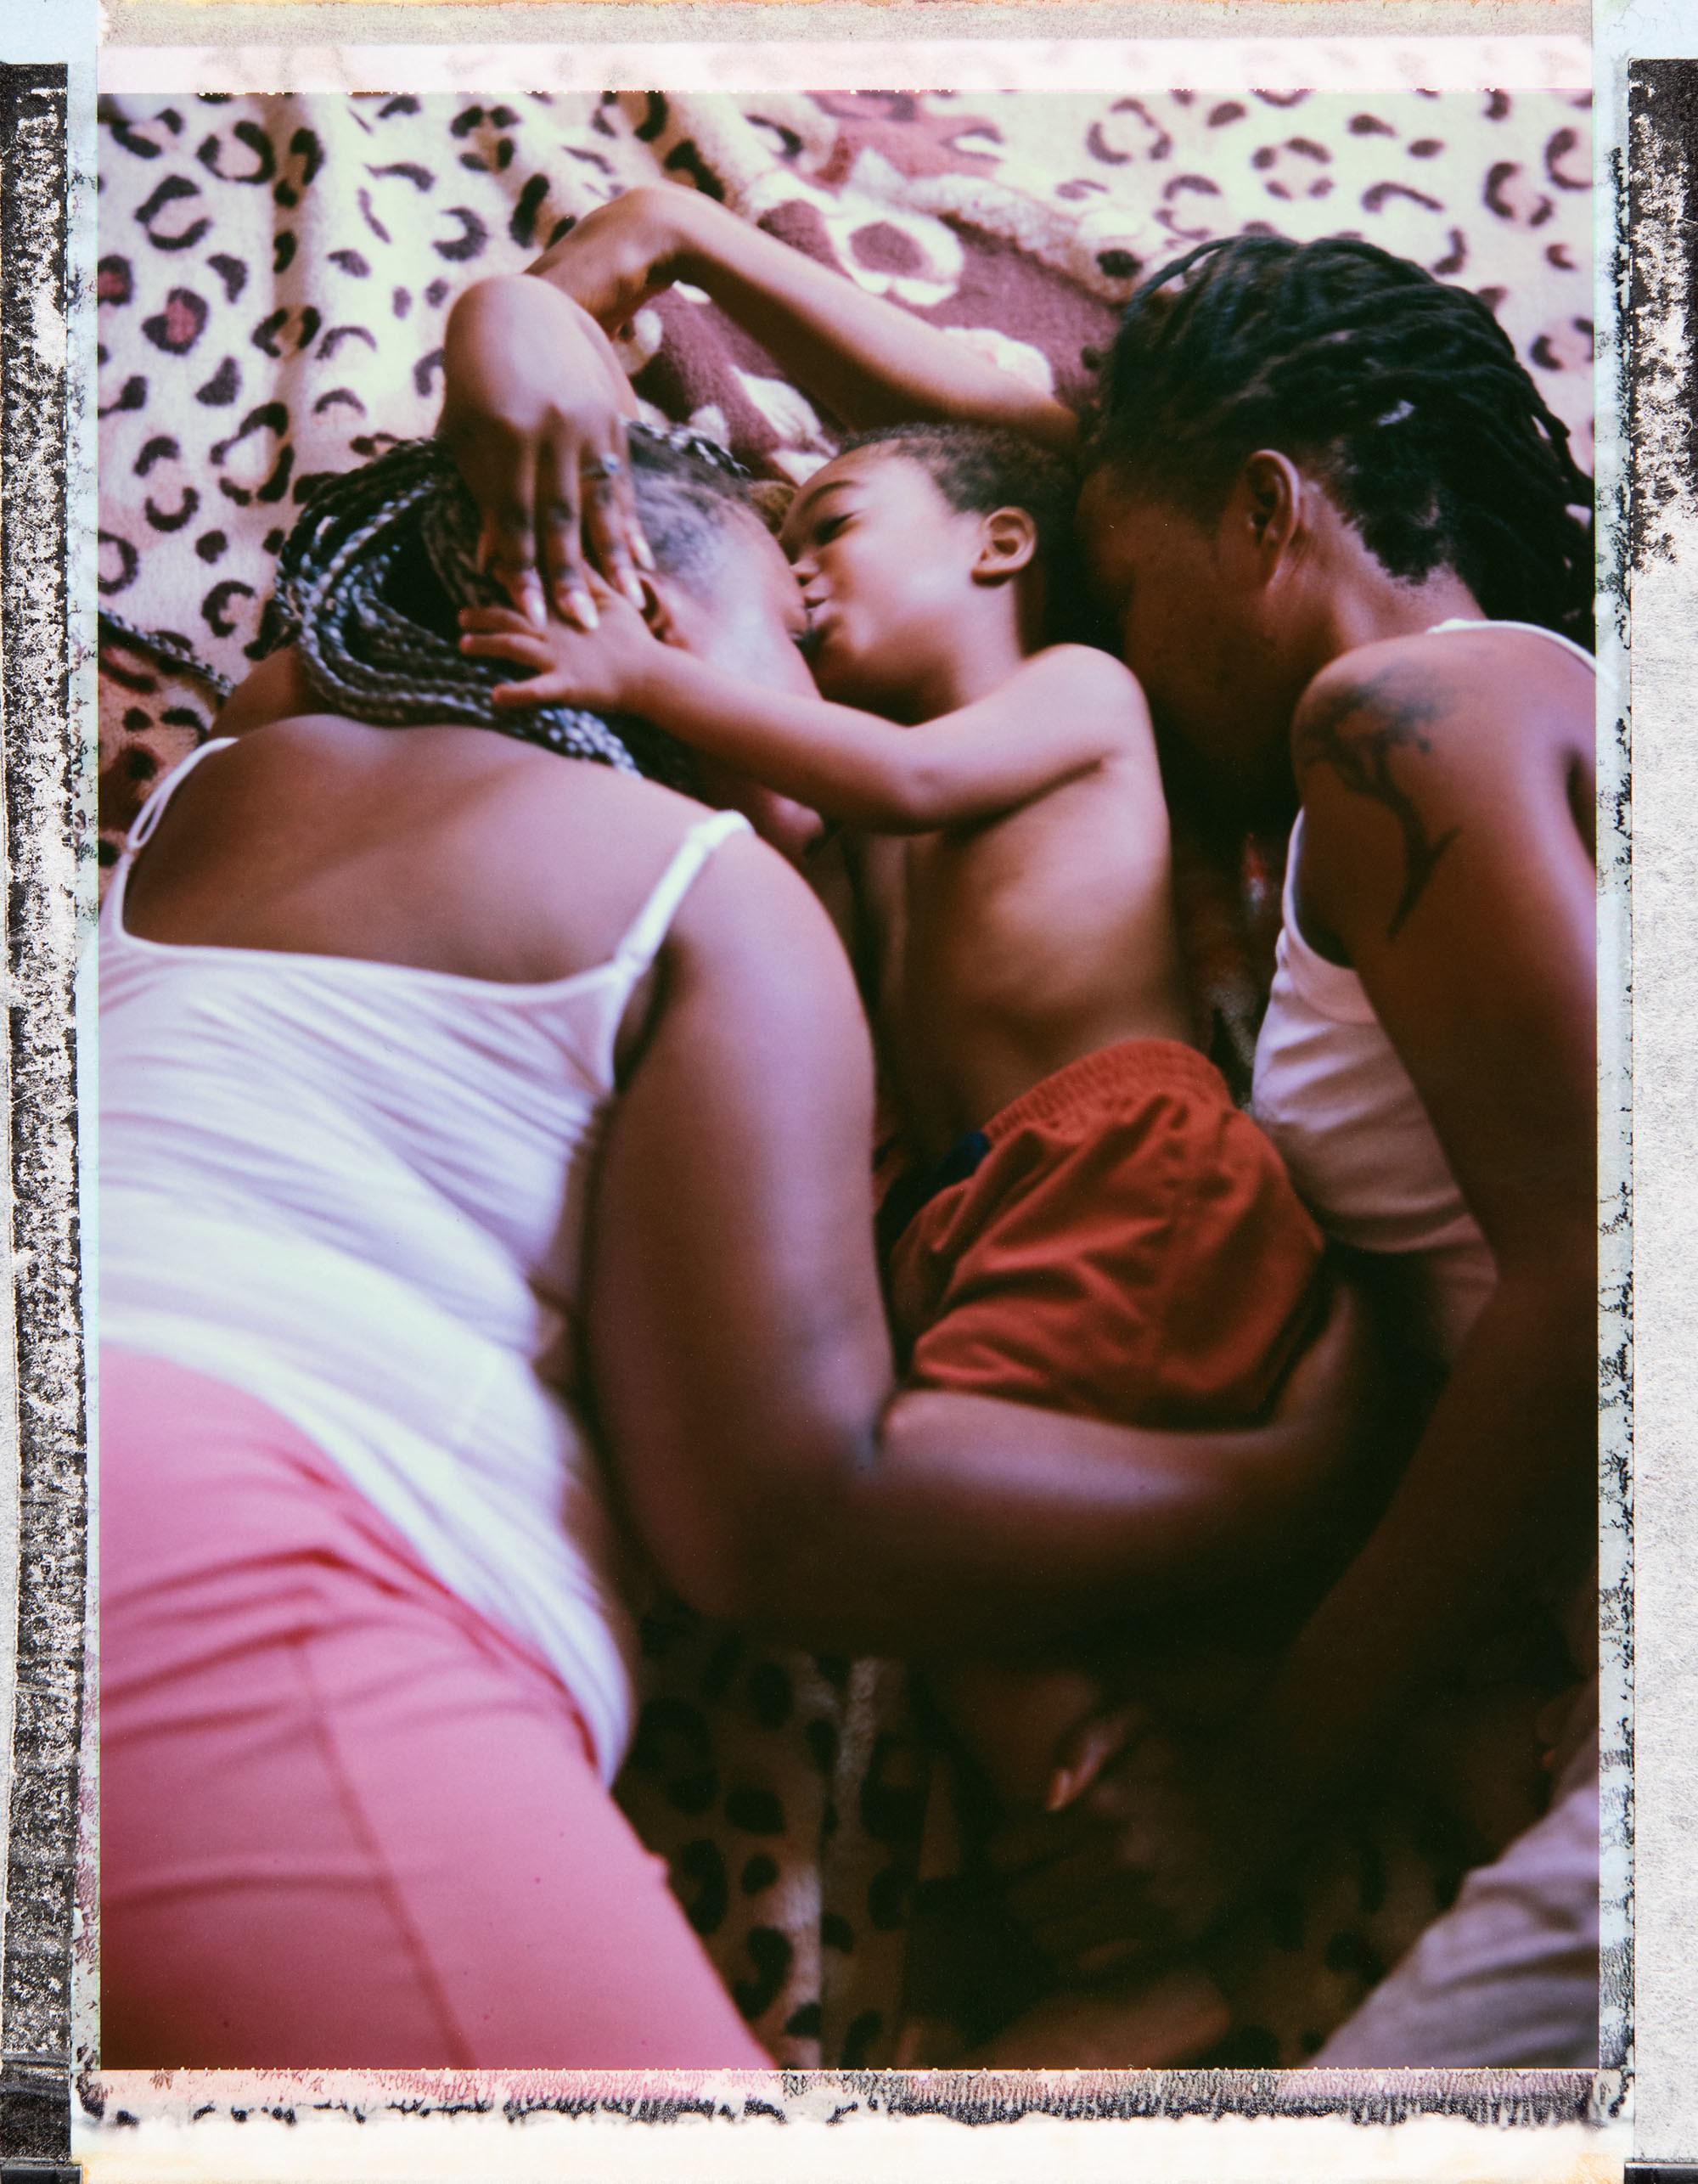 Two women hug a young boy lying down between them